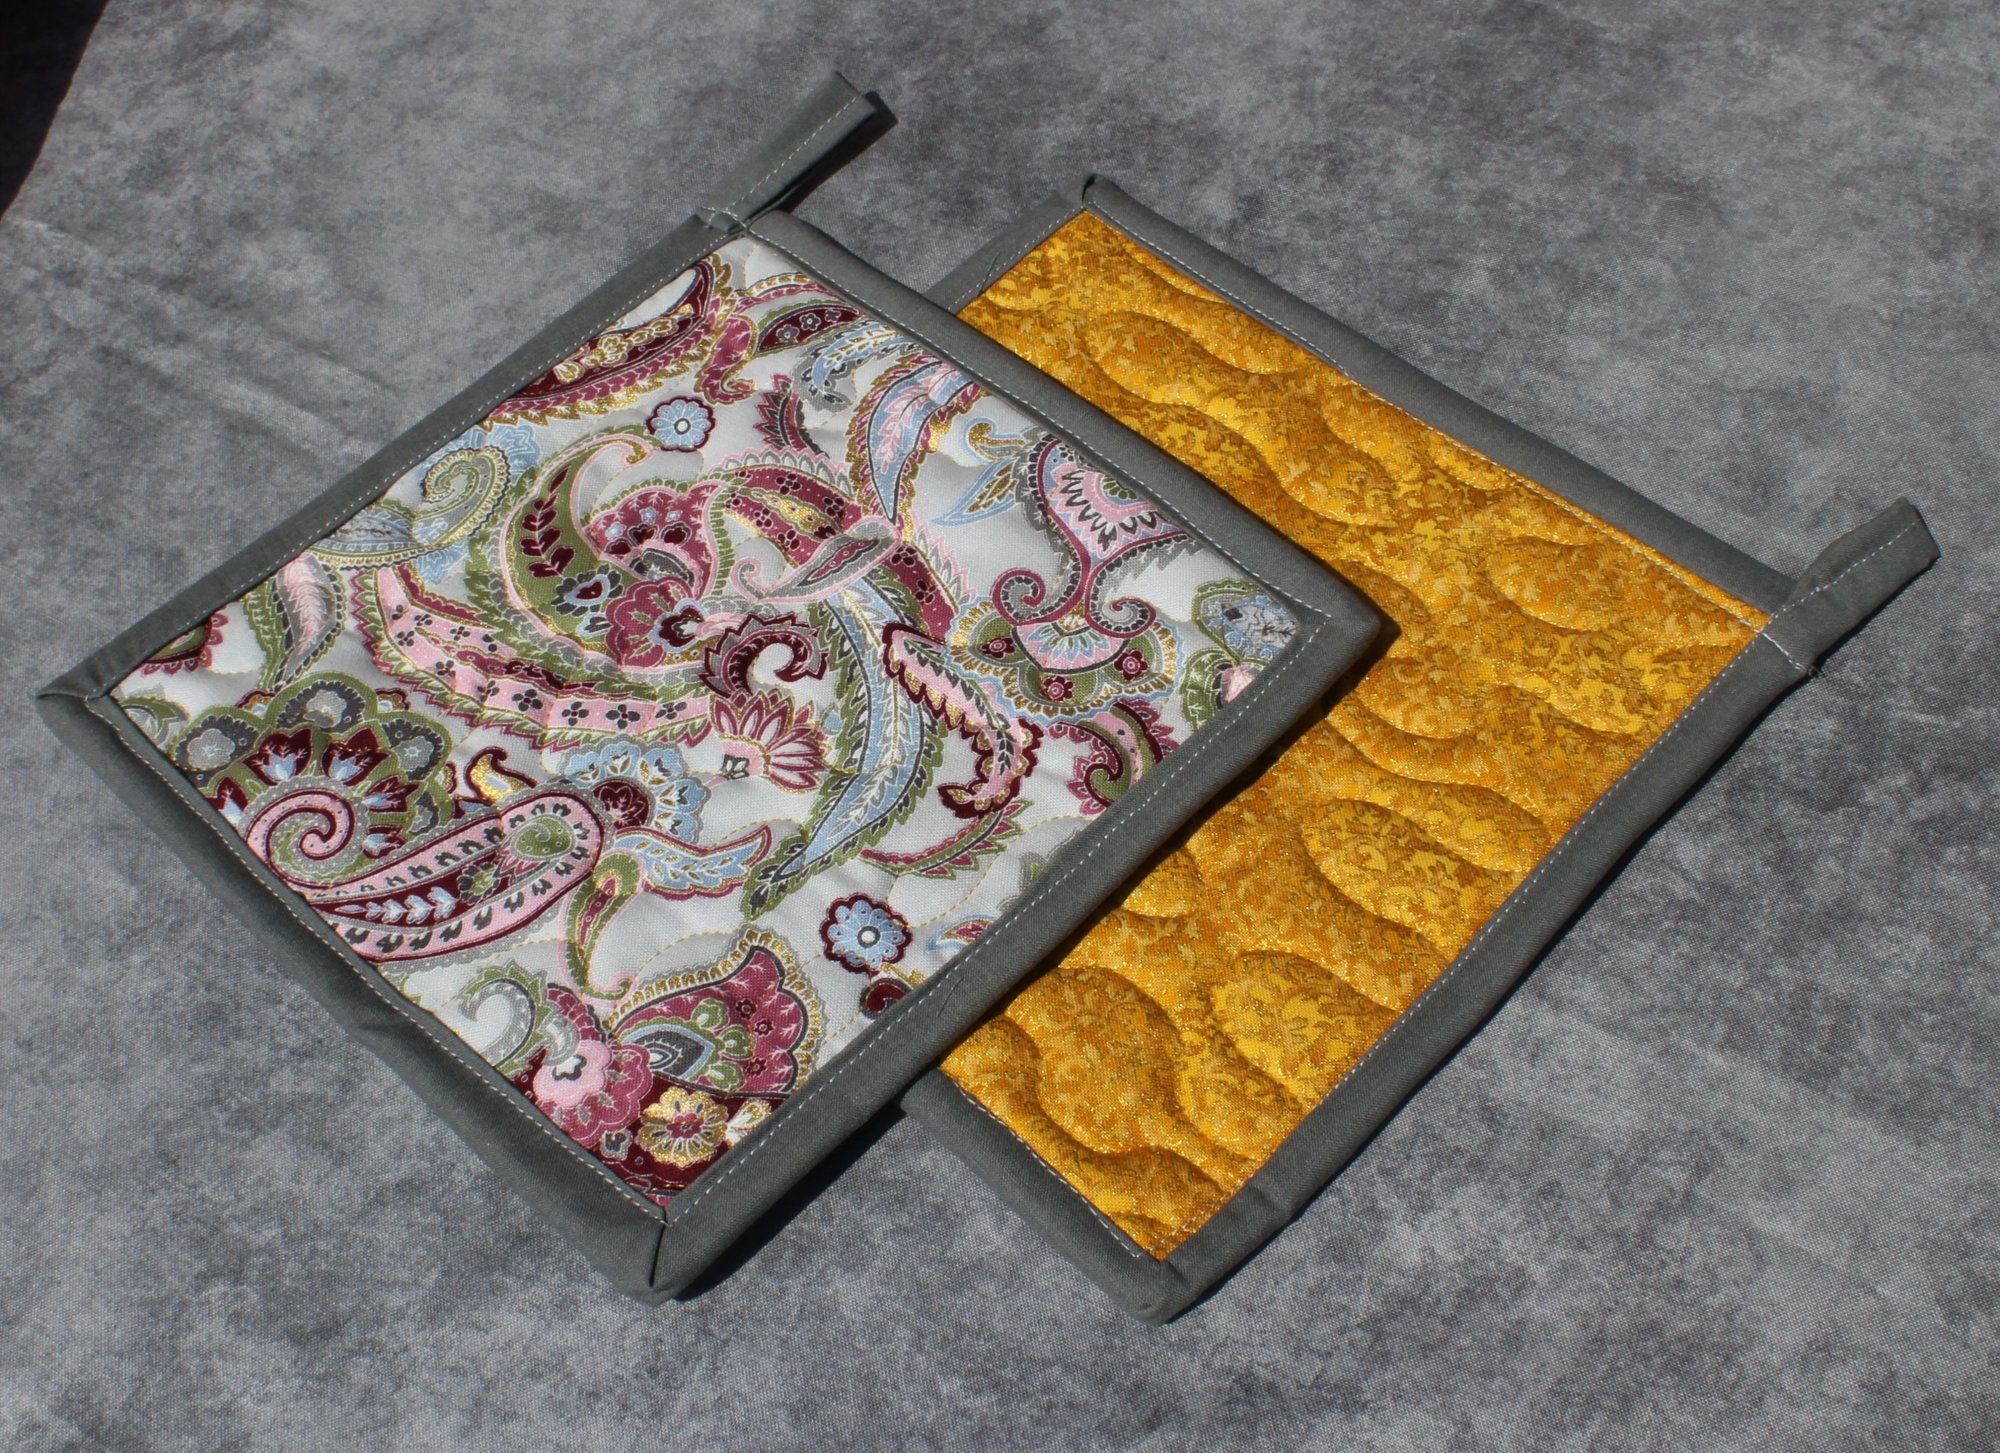 Gray/Pink/Green/Gold Swirling Paisleys Potholder Set of 2